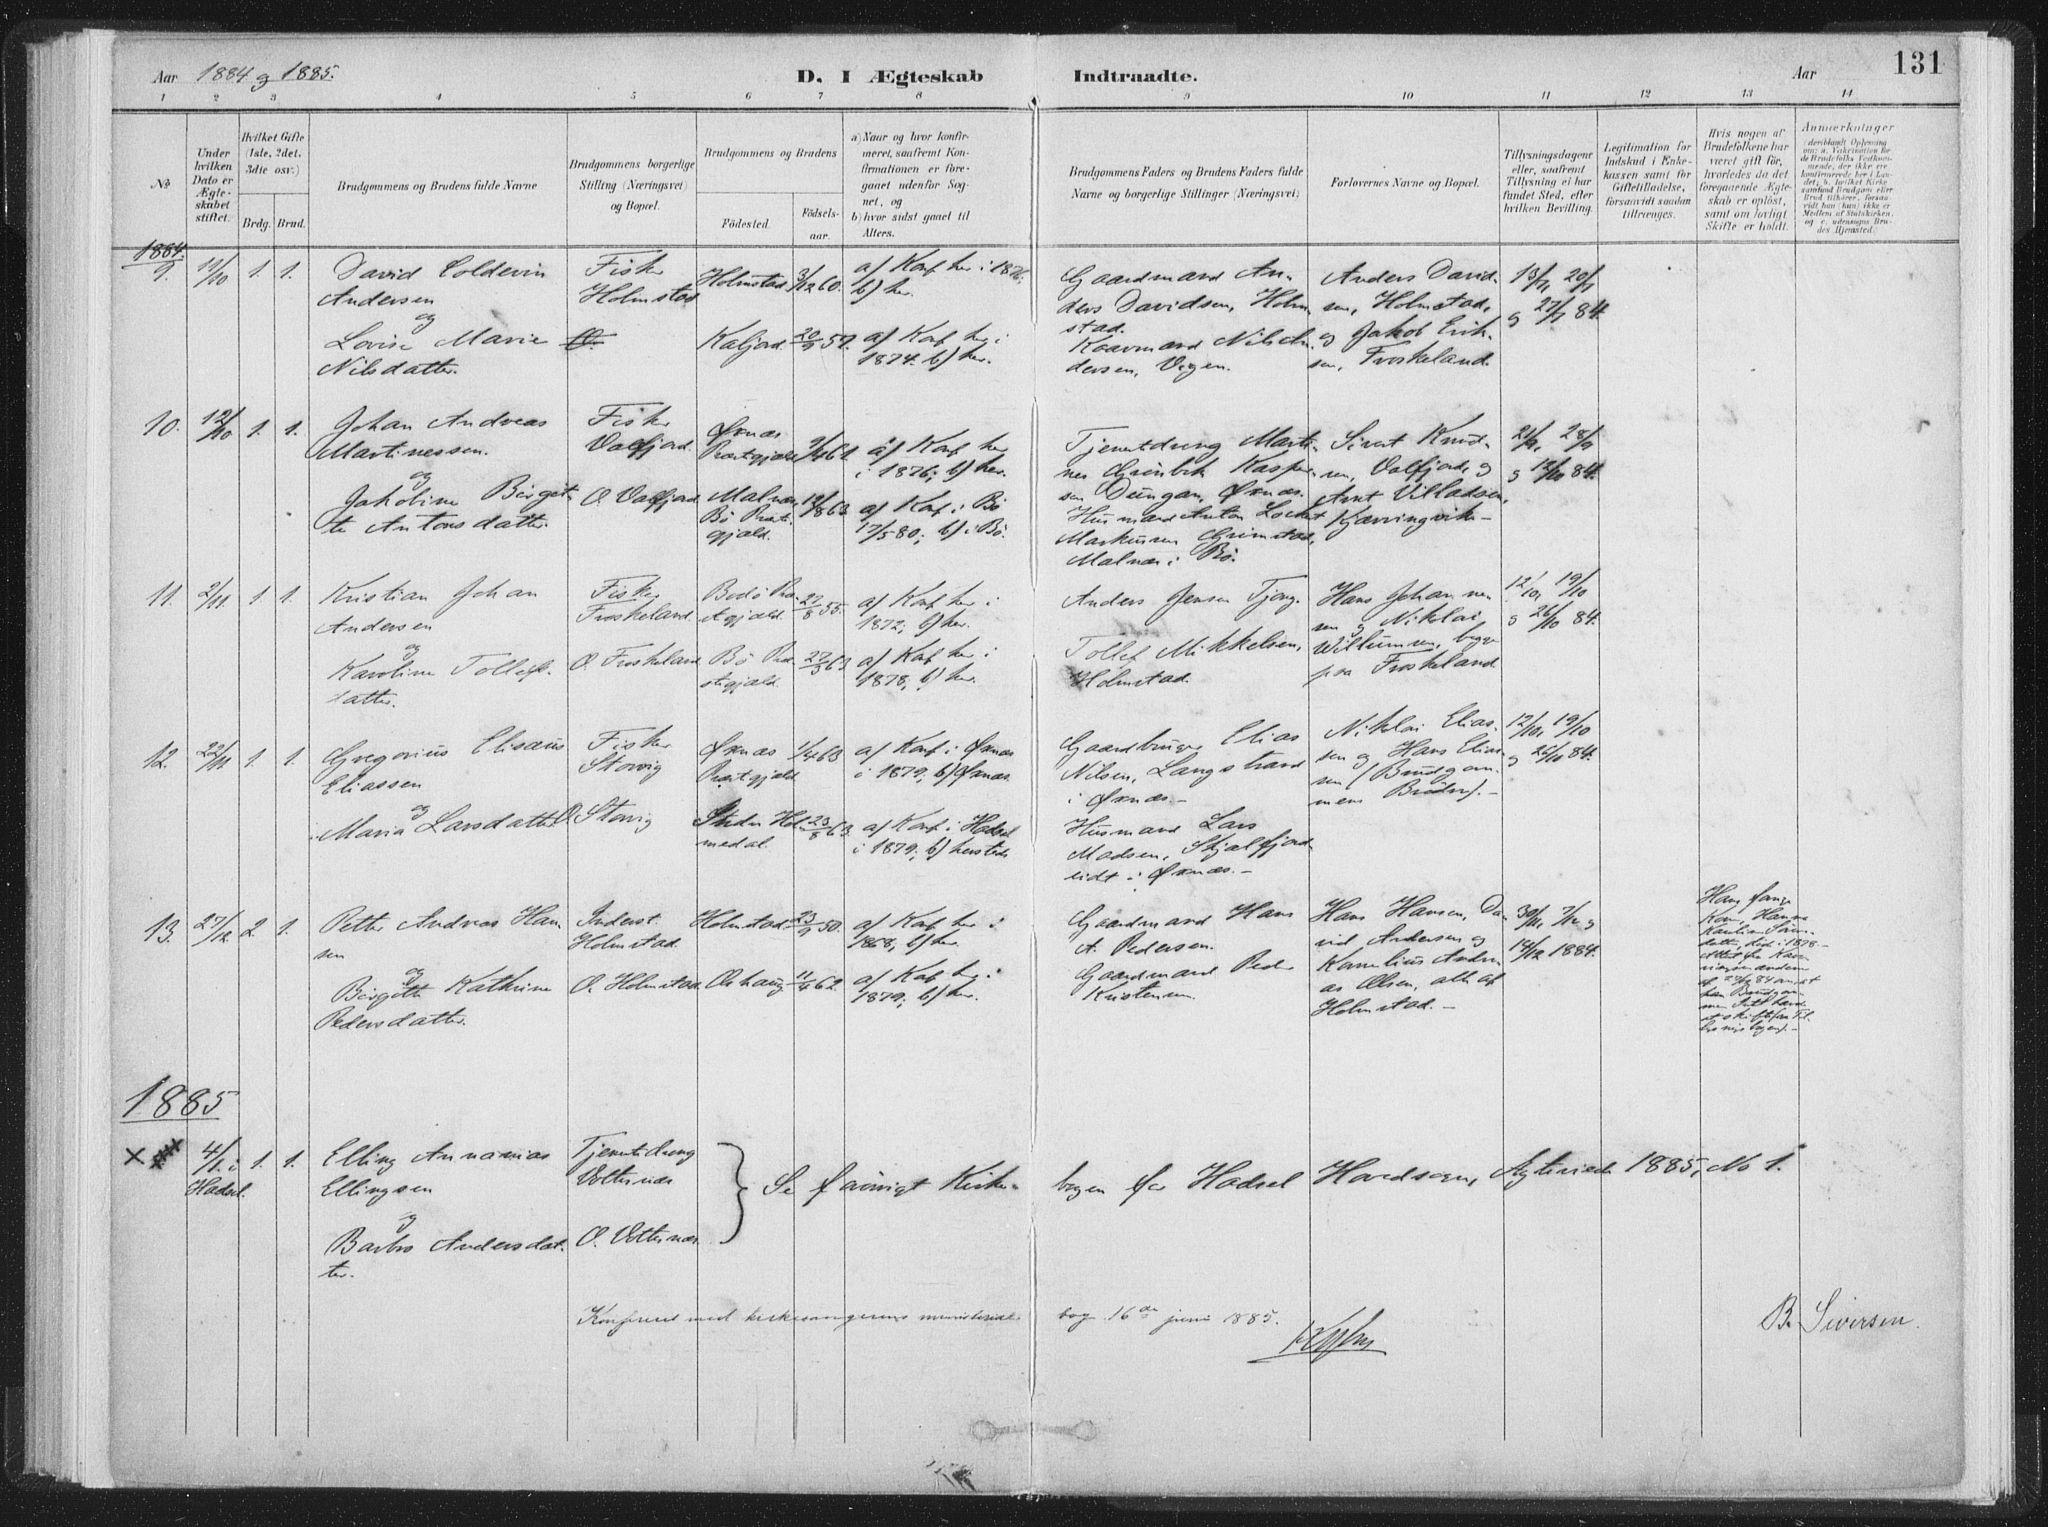 SAT, Ministerialprotokoller, klokkerbøker og fødselsregistre - Nordland, 890/L1286: Ministerialbok nr. 890A01, 1882-1902, s. 131